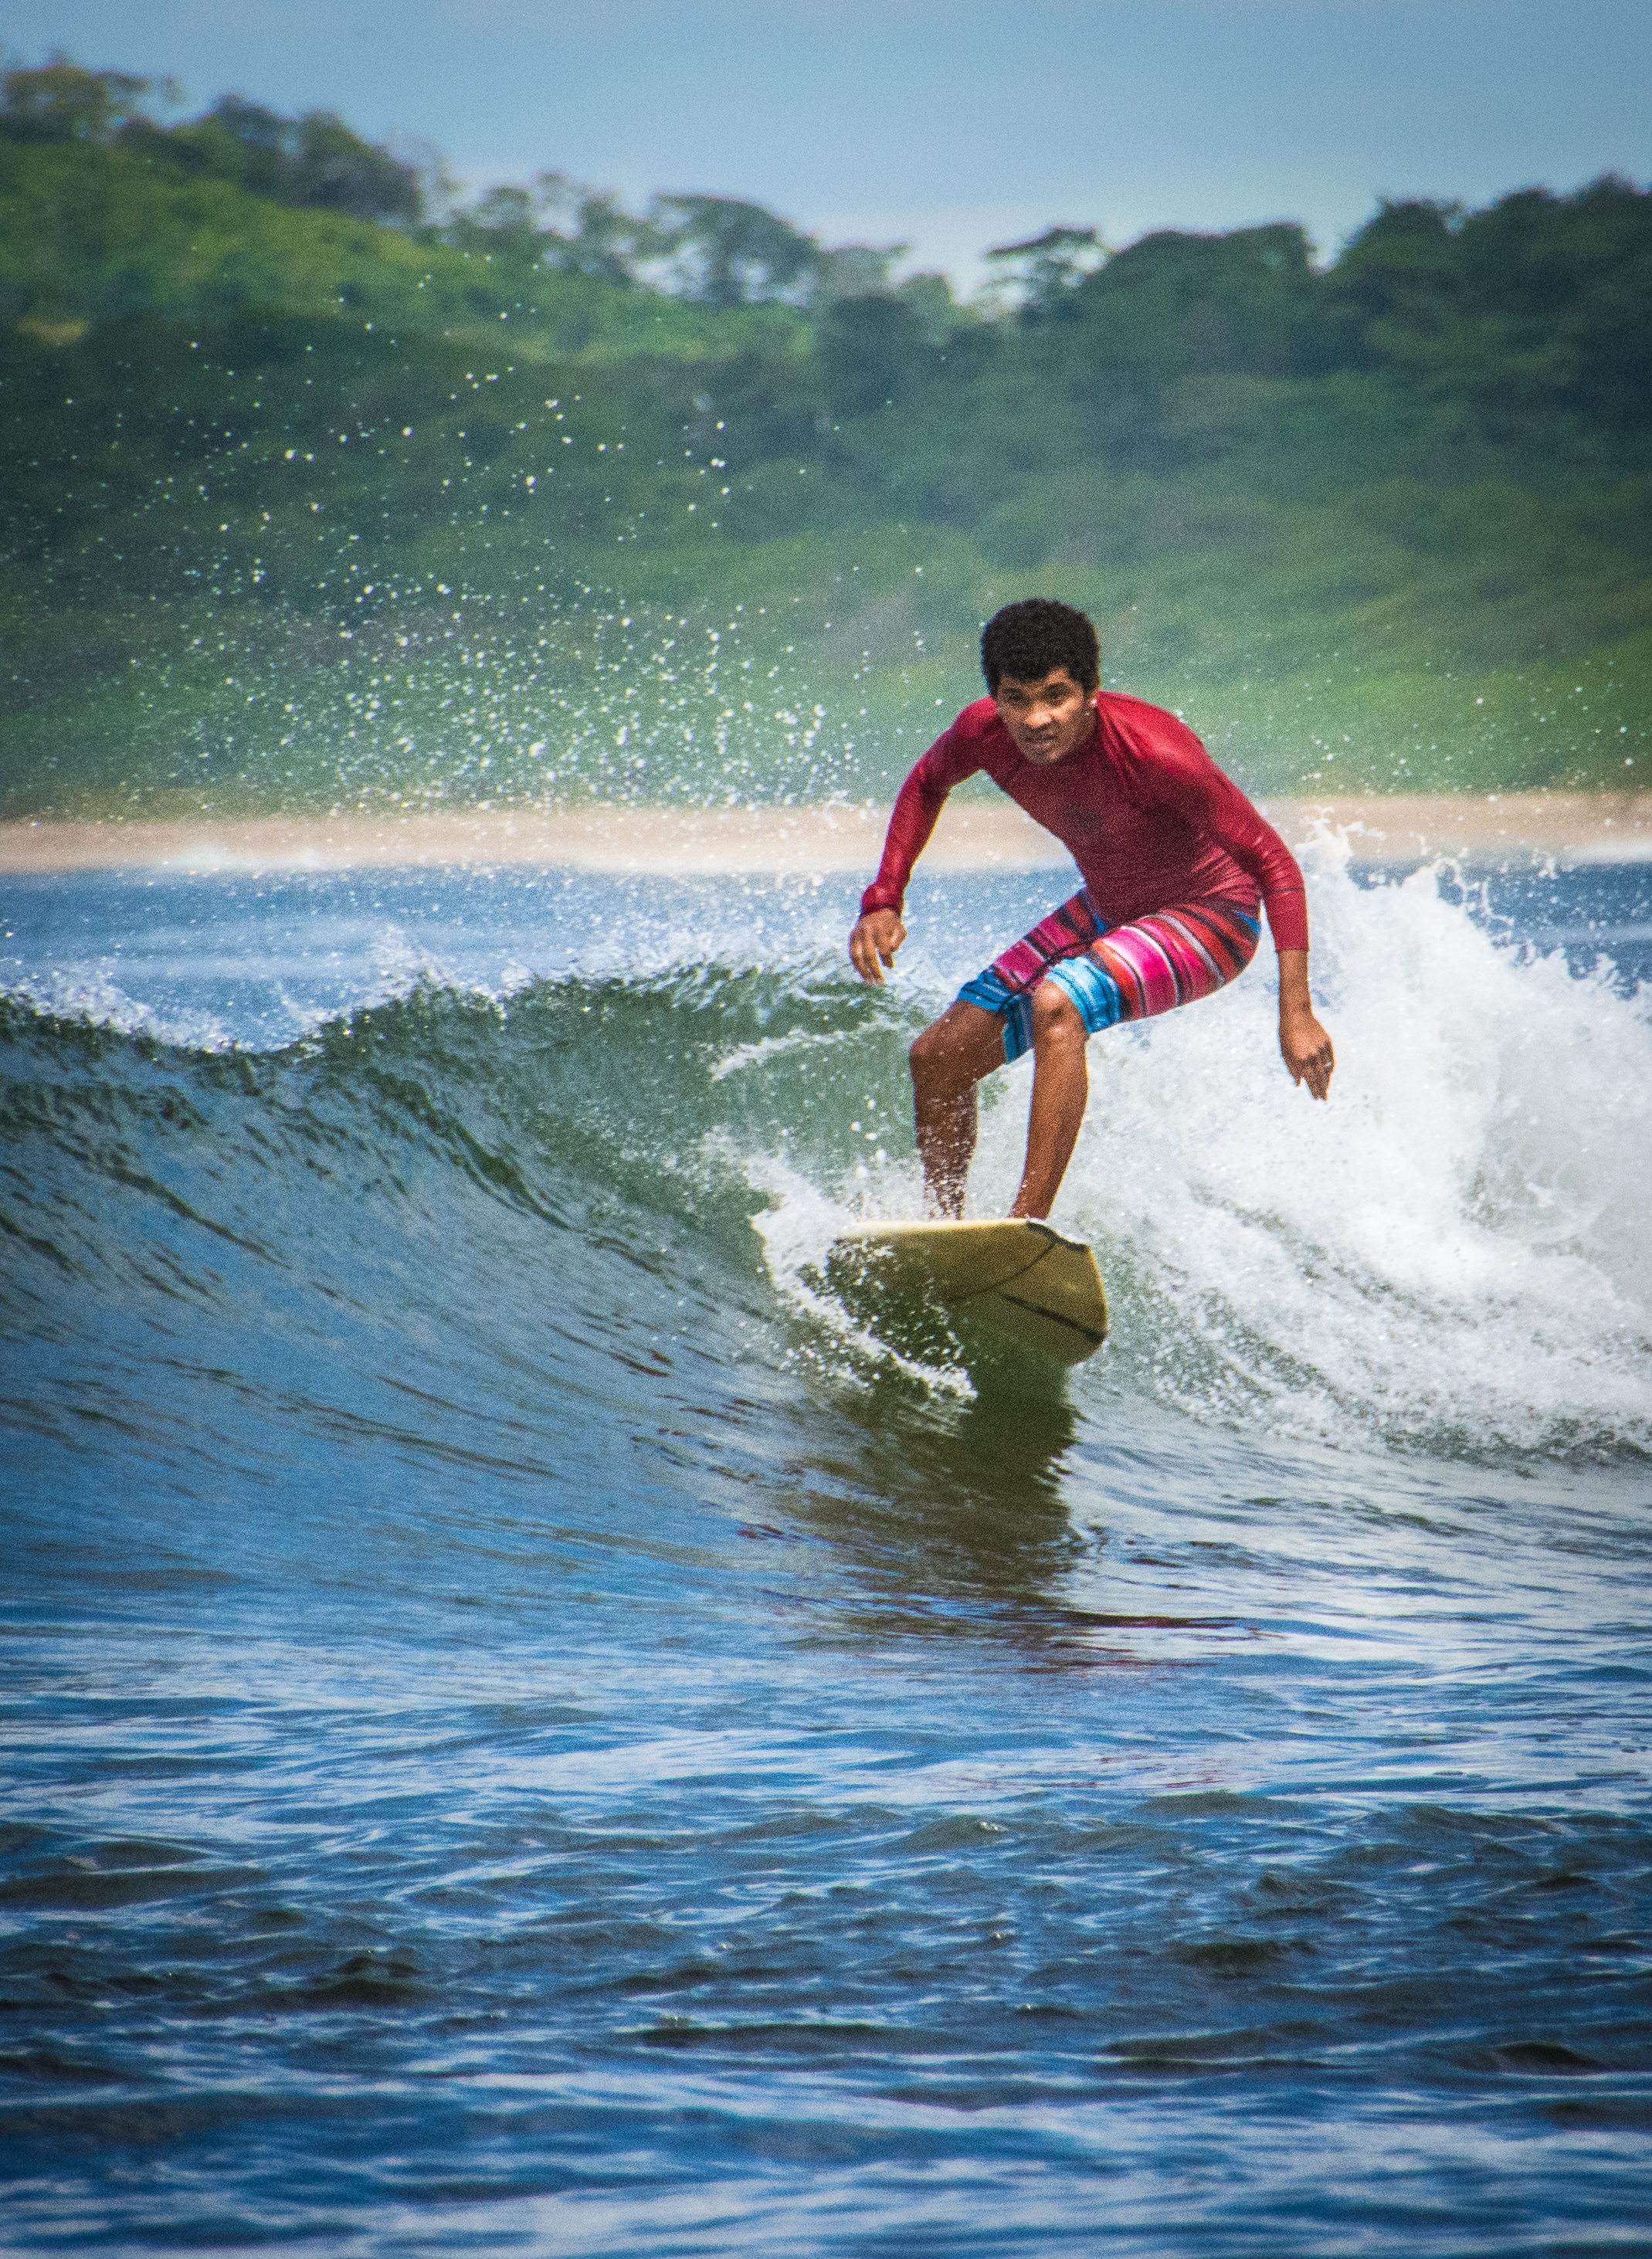 Surfing in Tamarindo, Costa Rica.